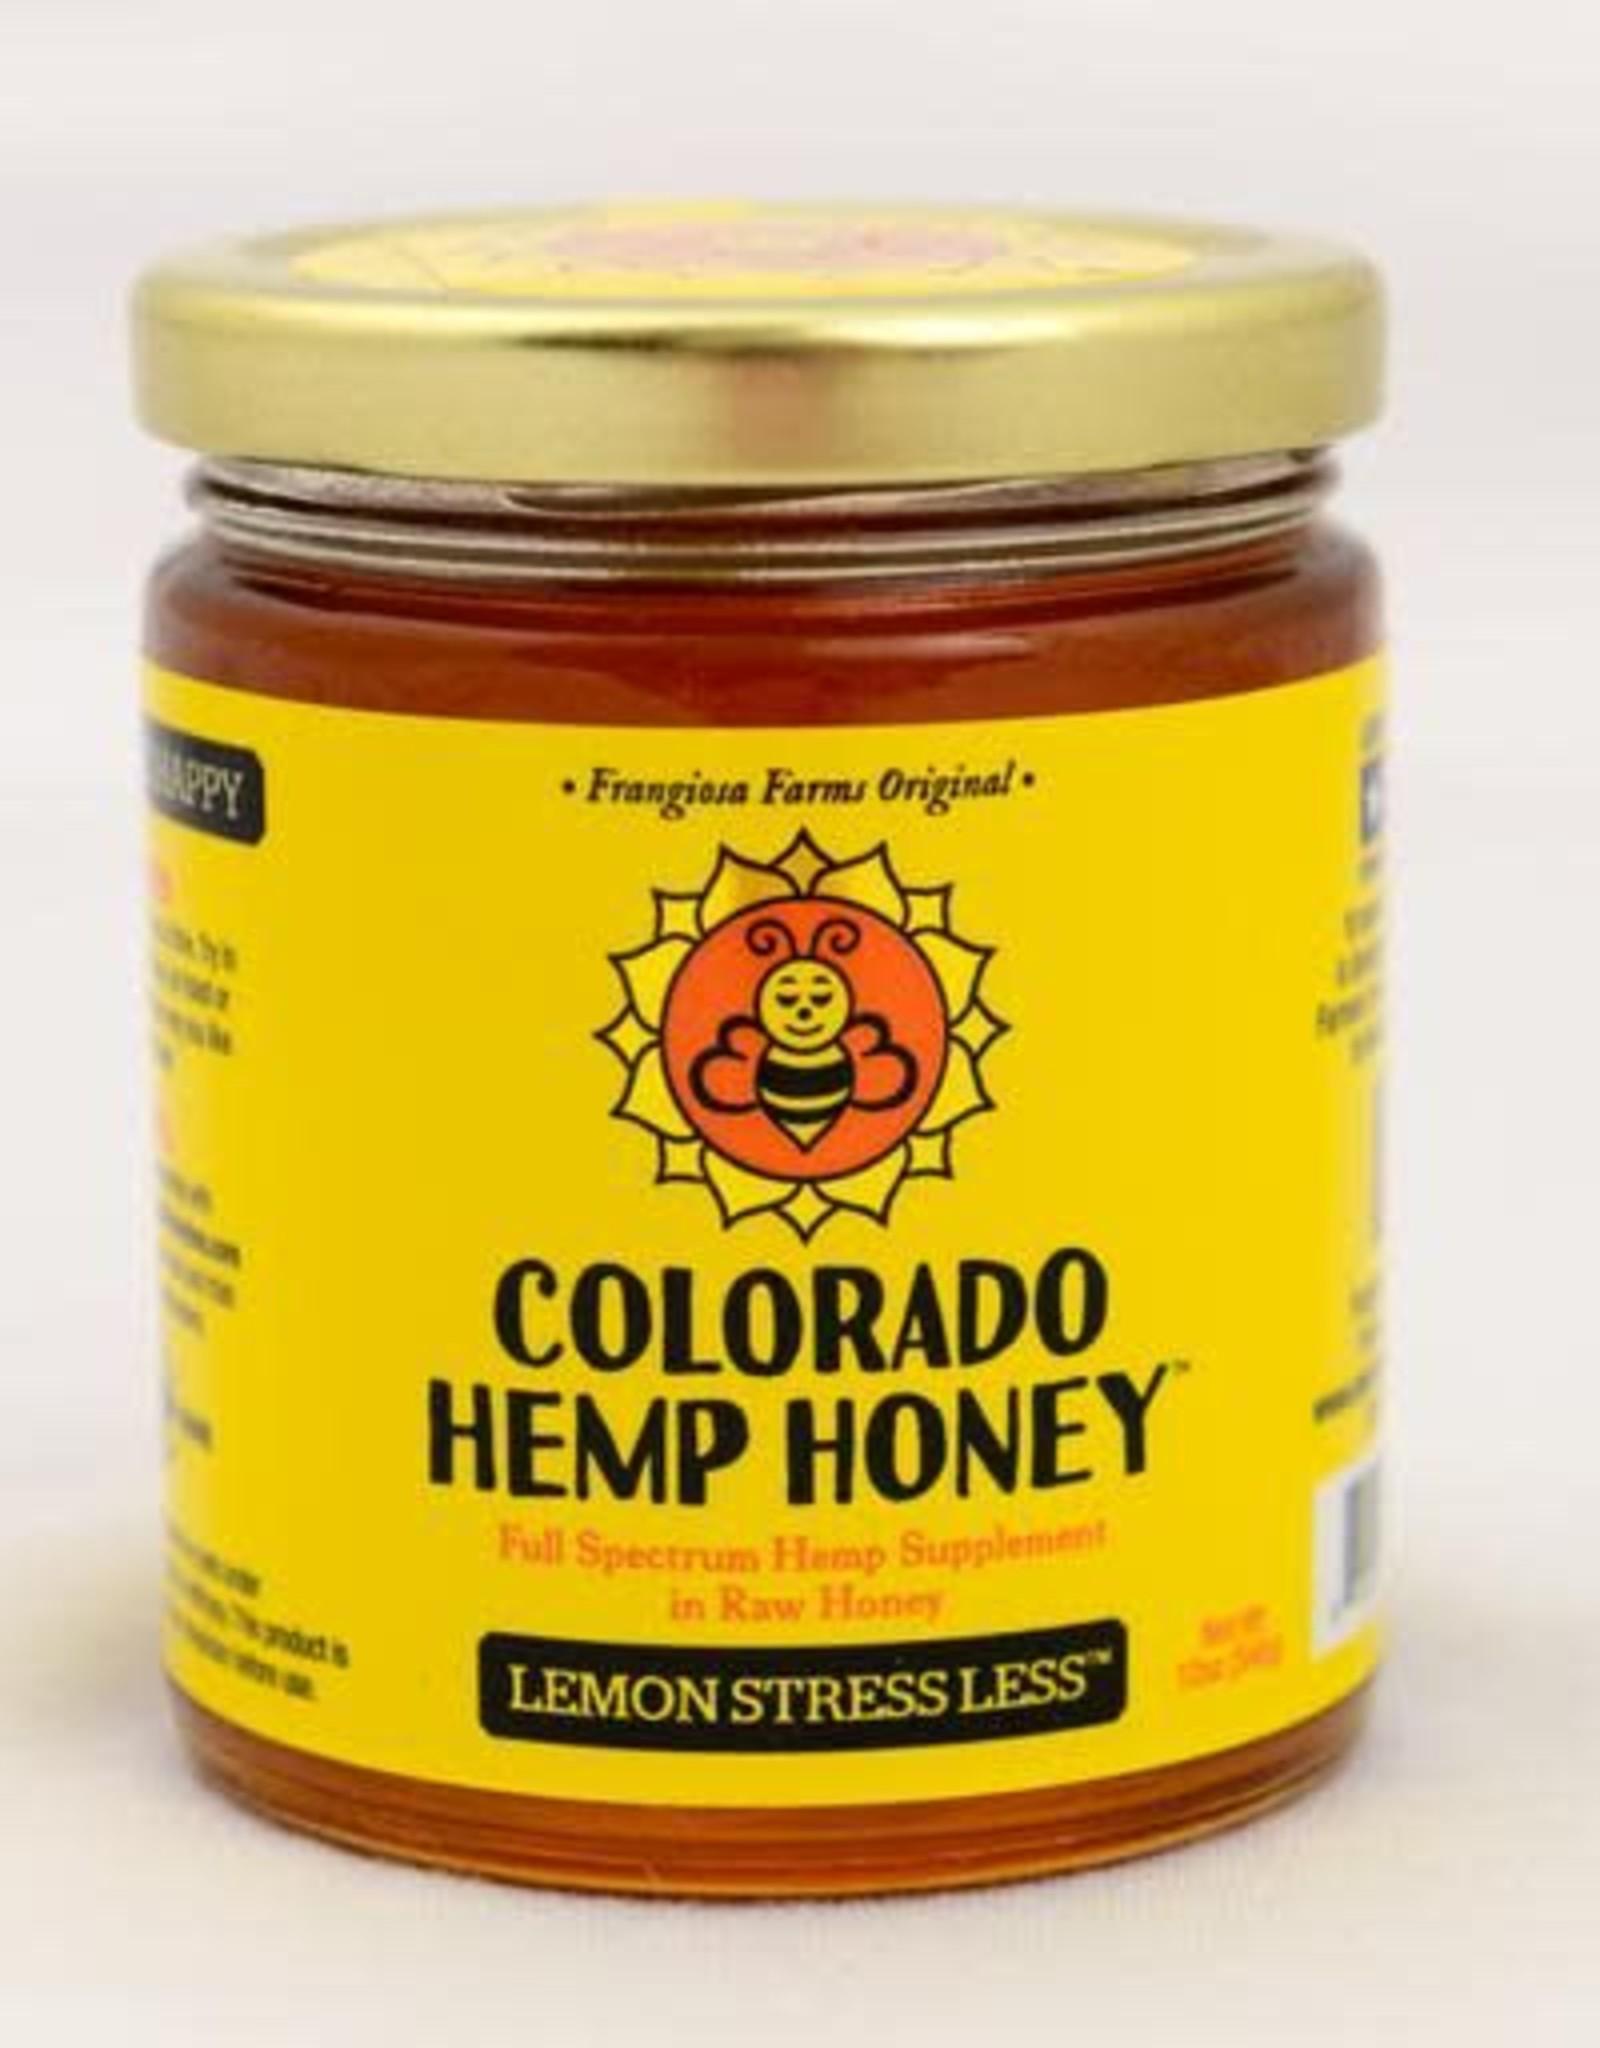 Colorado Hemp Honey Colorado Hemp Honey Lemon Stress Less 6oz Jar